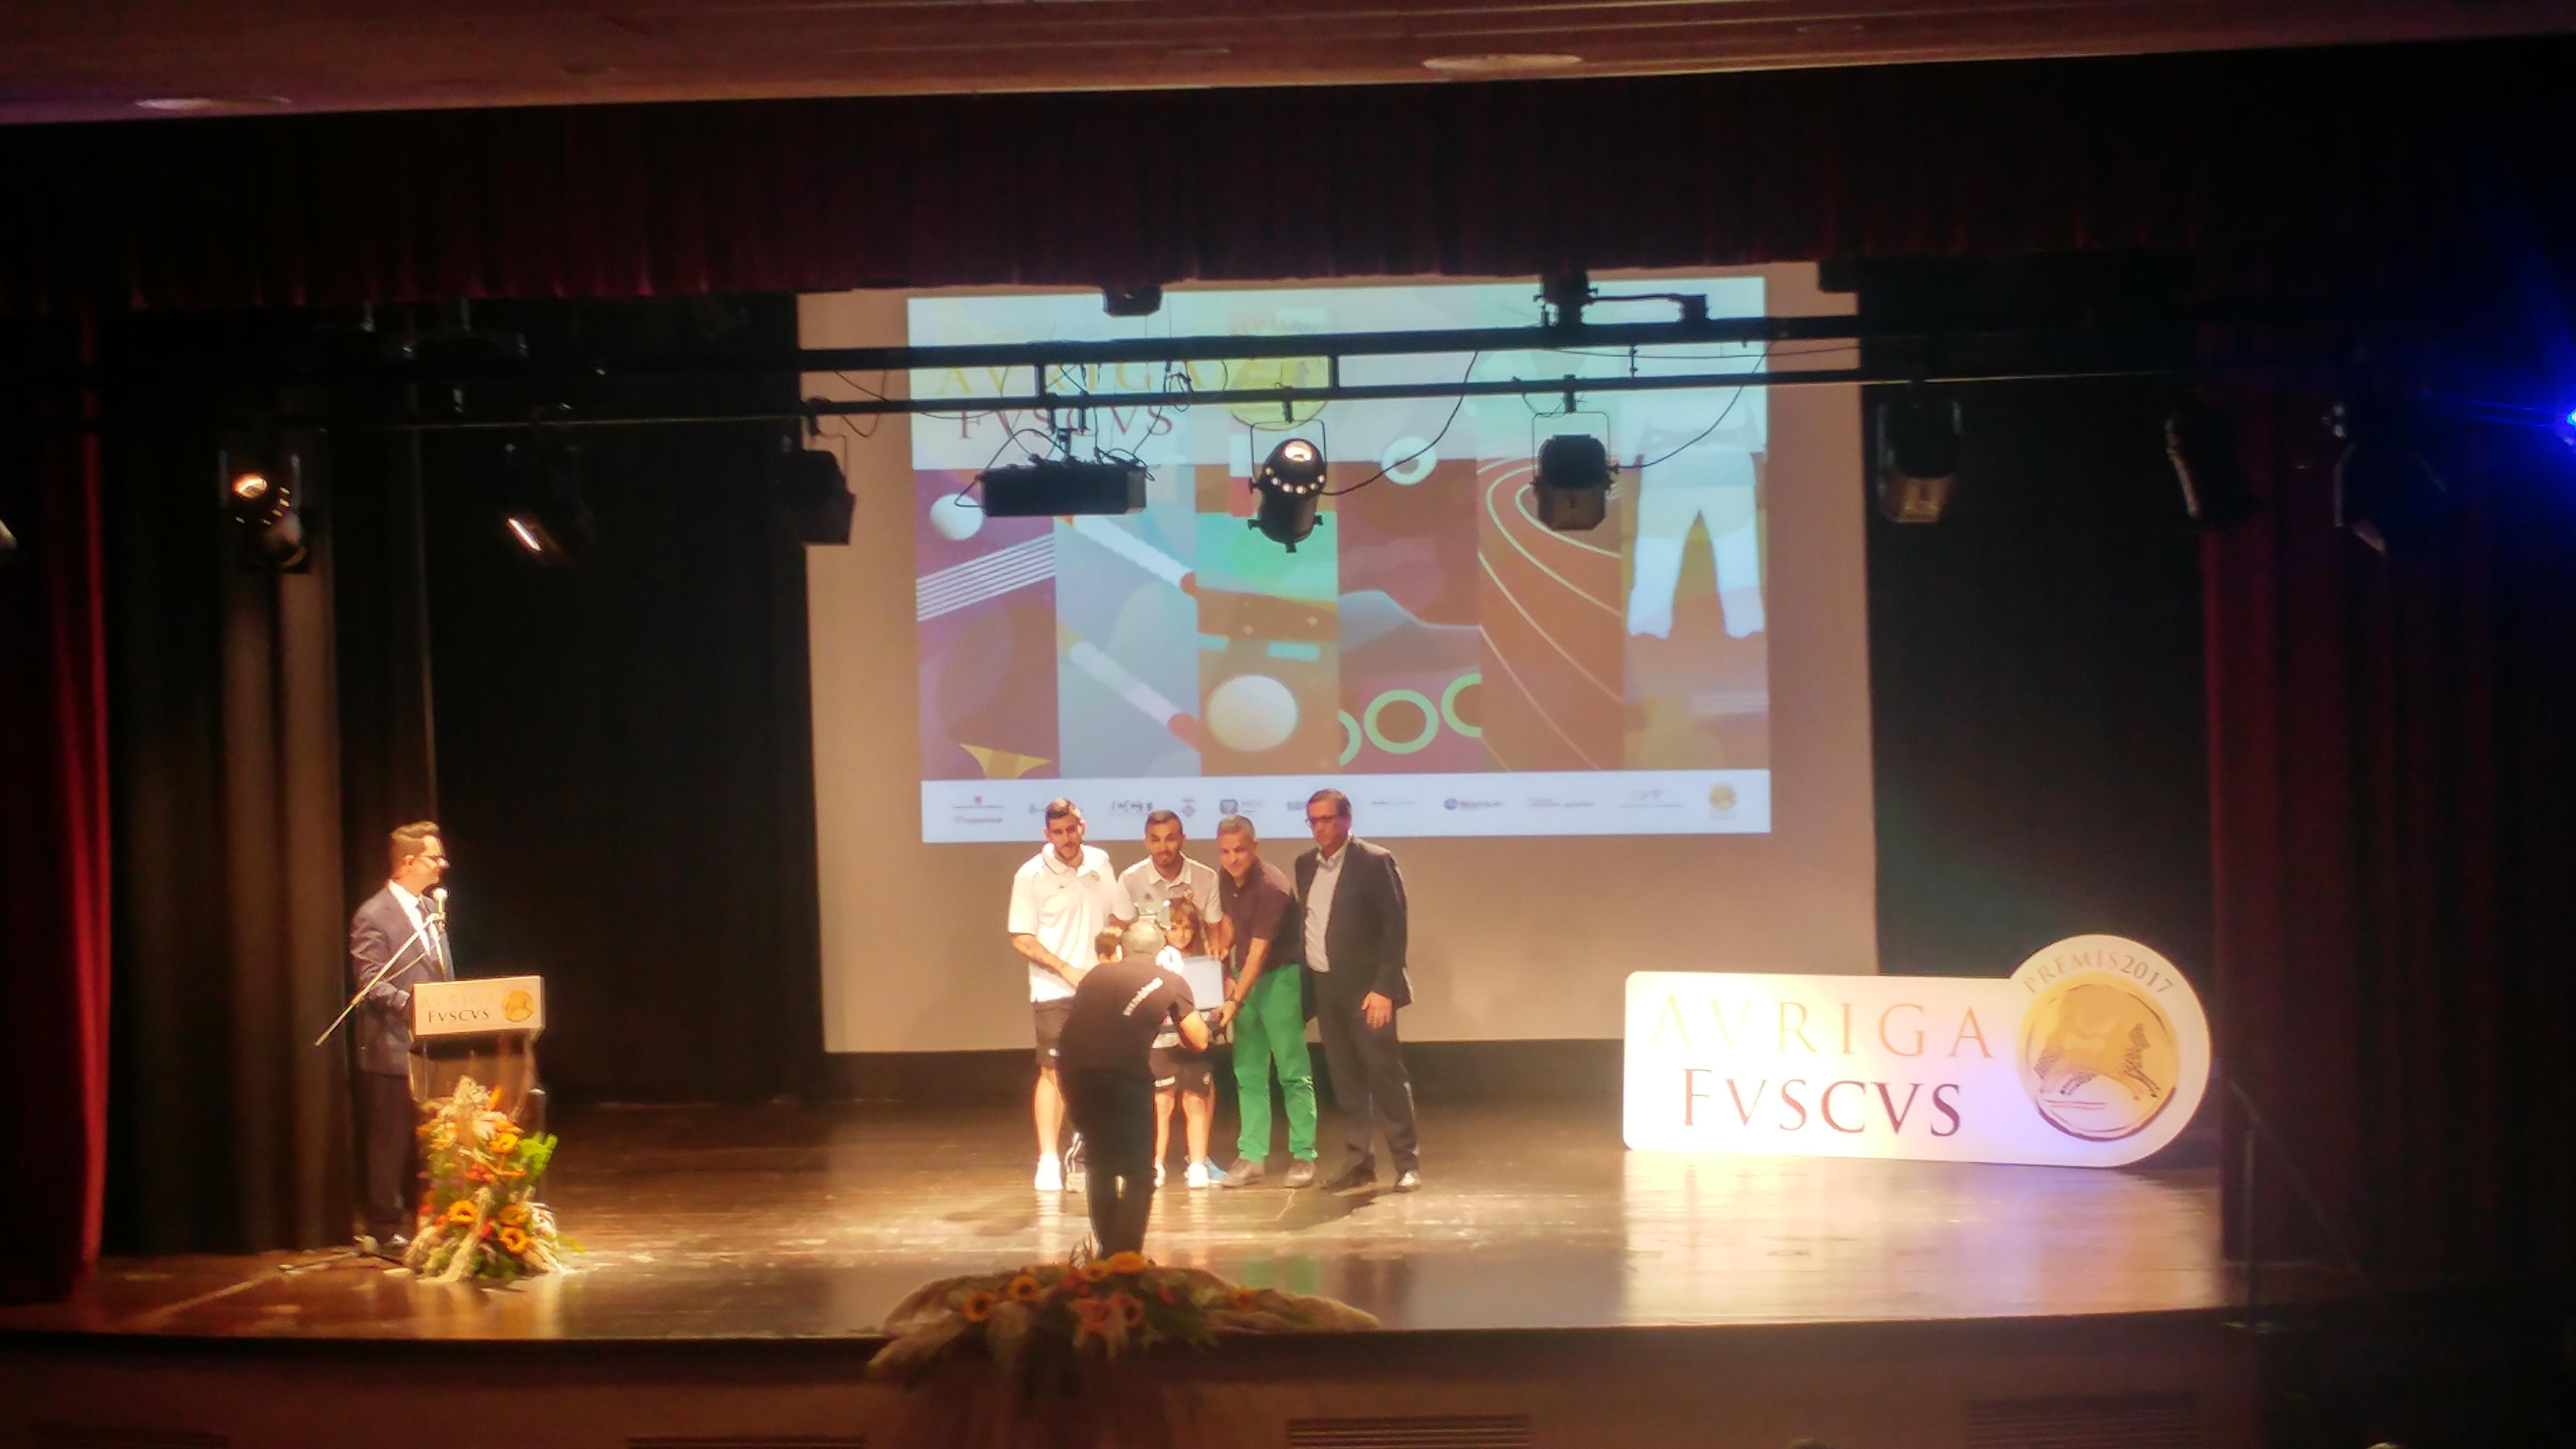 premios auriga fvscvs everama